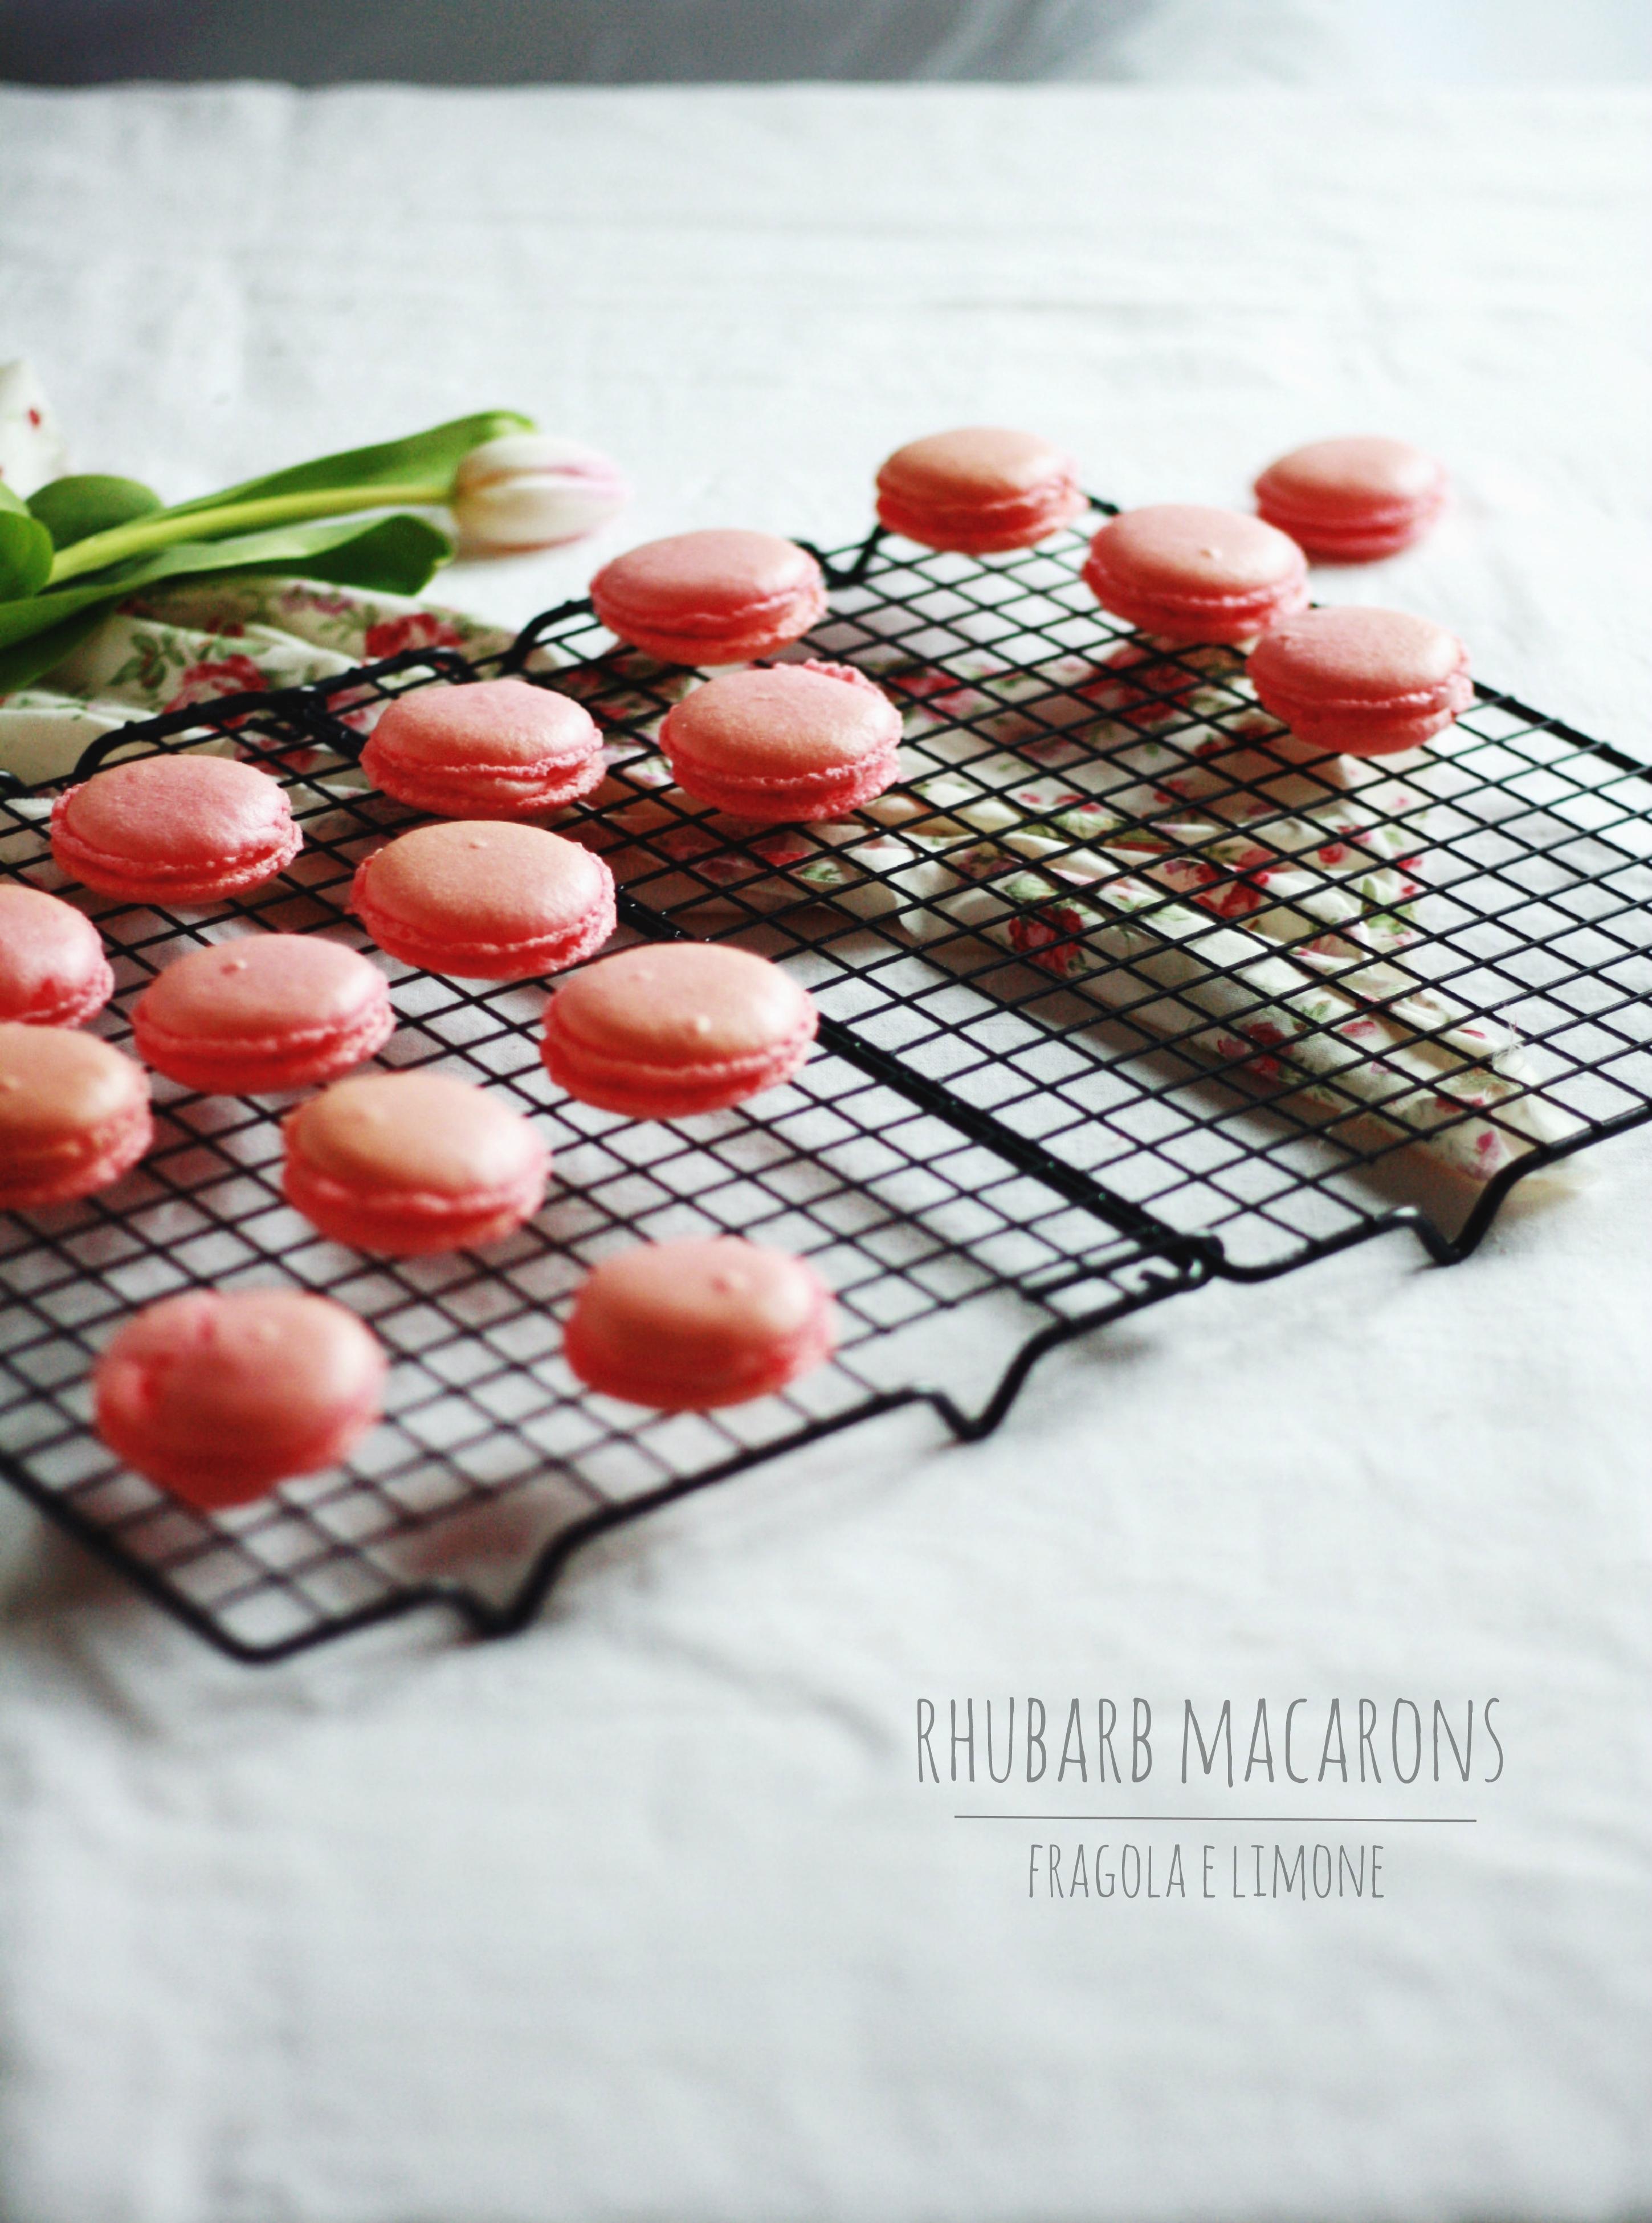 rhubarb macaron